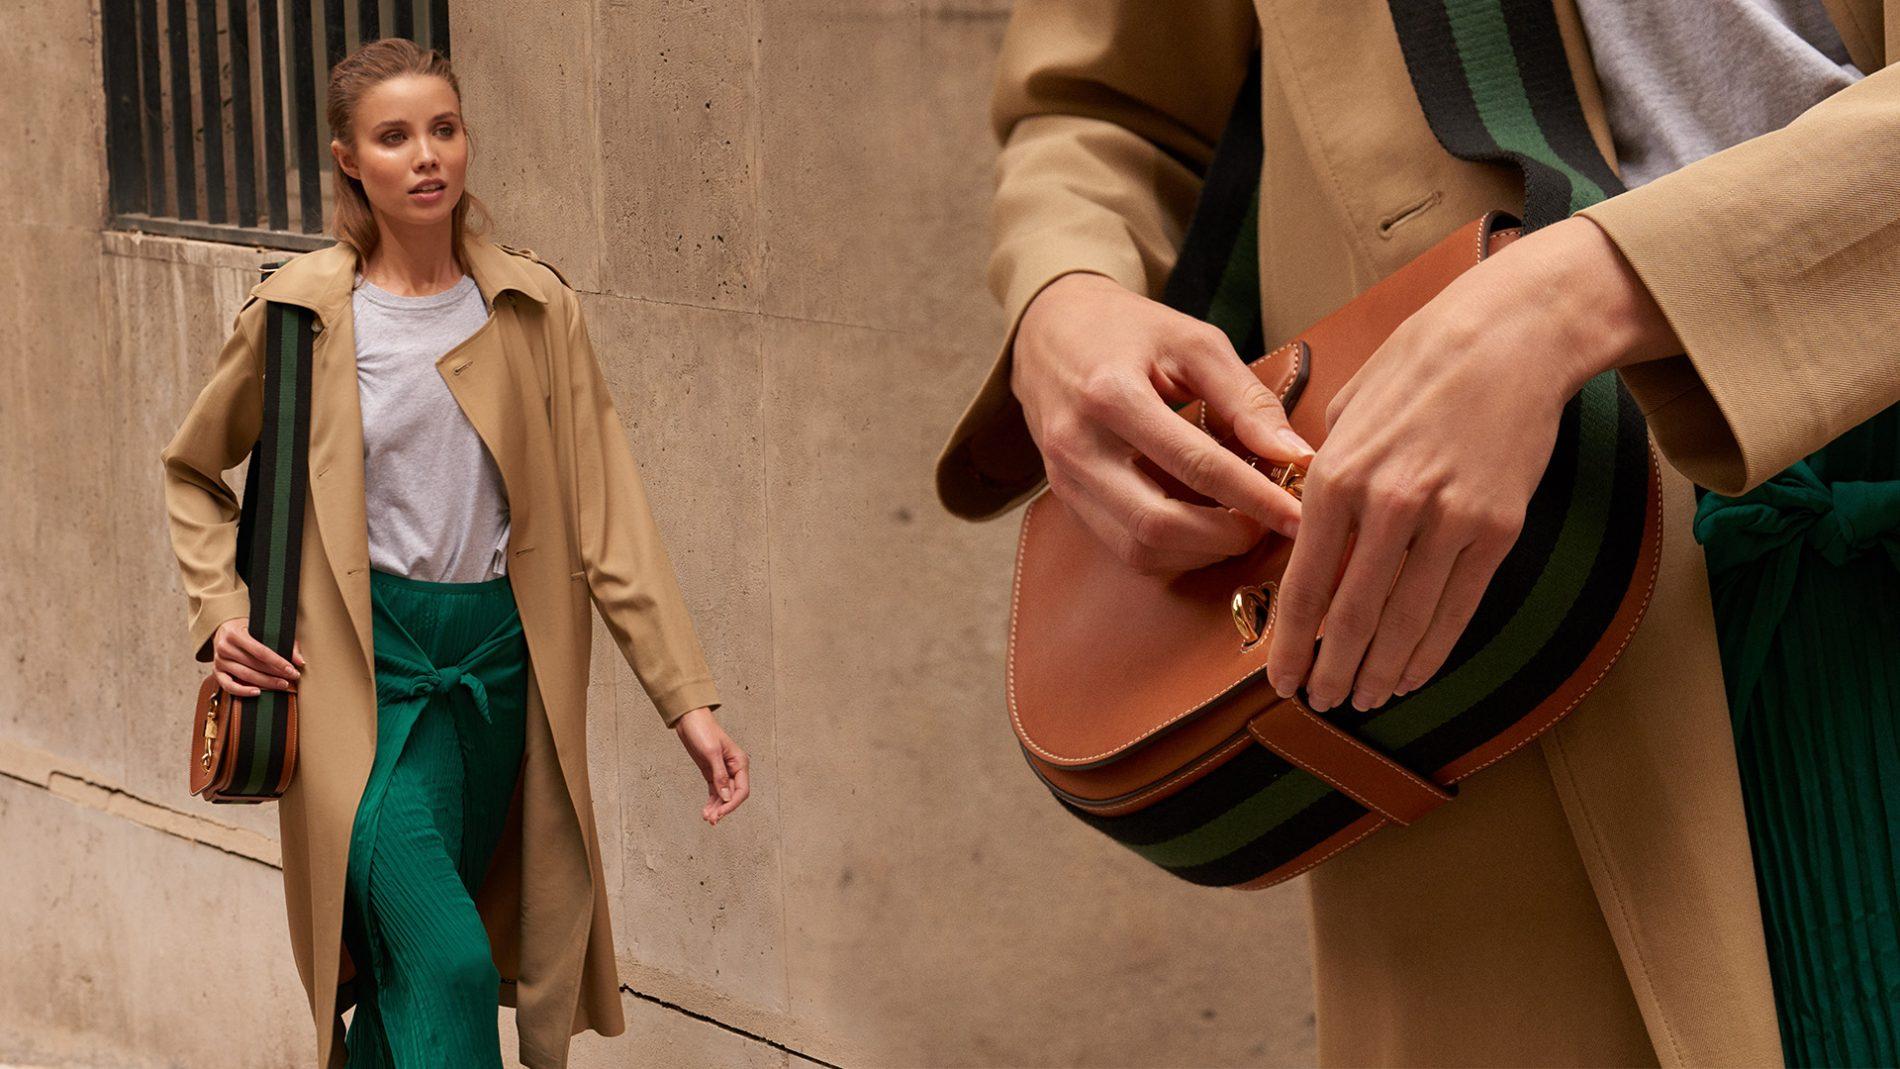 El Corte Inglés Ready-To-Wear Handbags Etro Victoria Beckham Helmut Lang